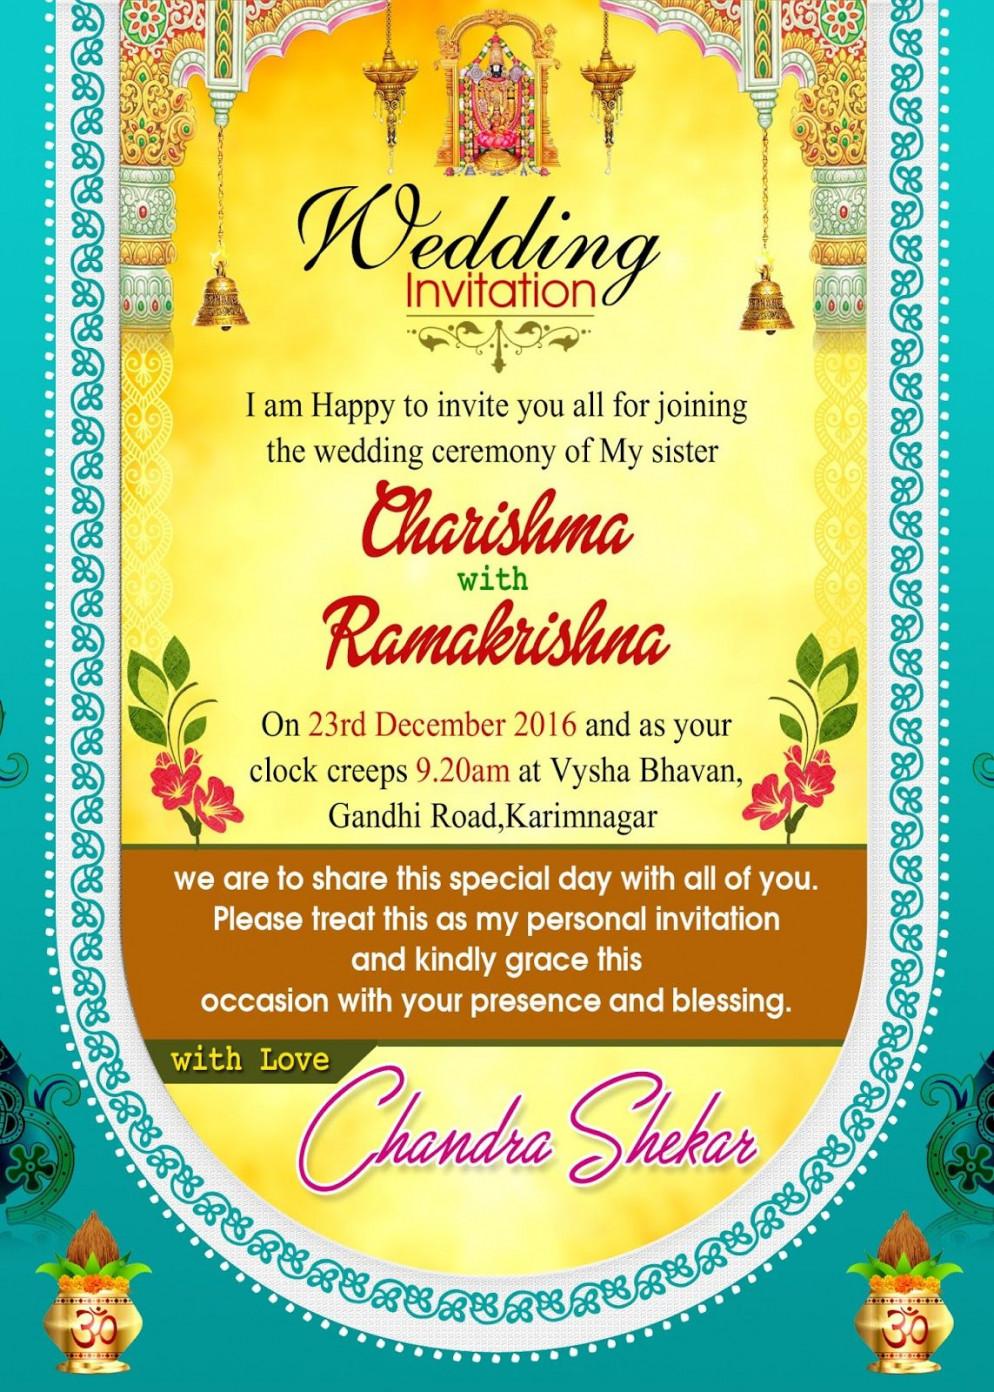 9 Card And Invitation Maker Free Indian Wedding Invitation Wording Wedding Card Design Indian Indian Wedding Invitations